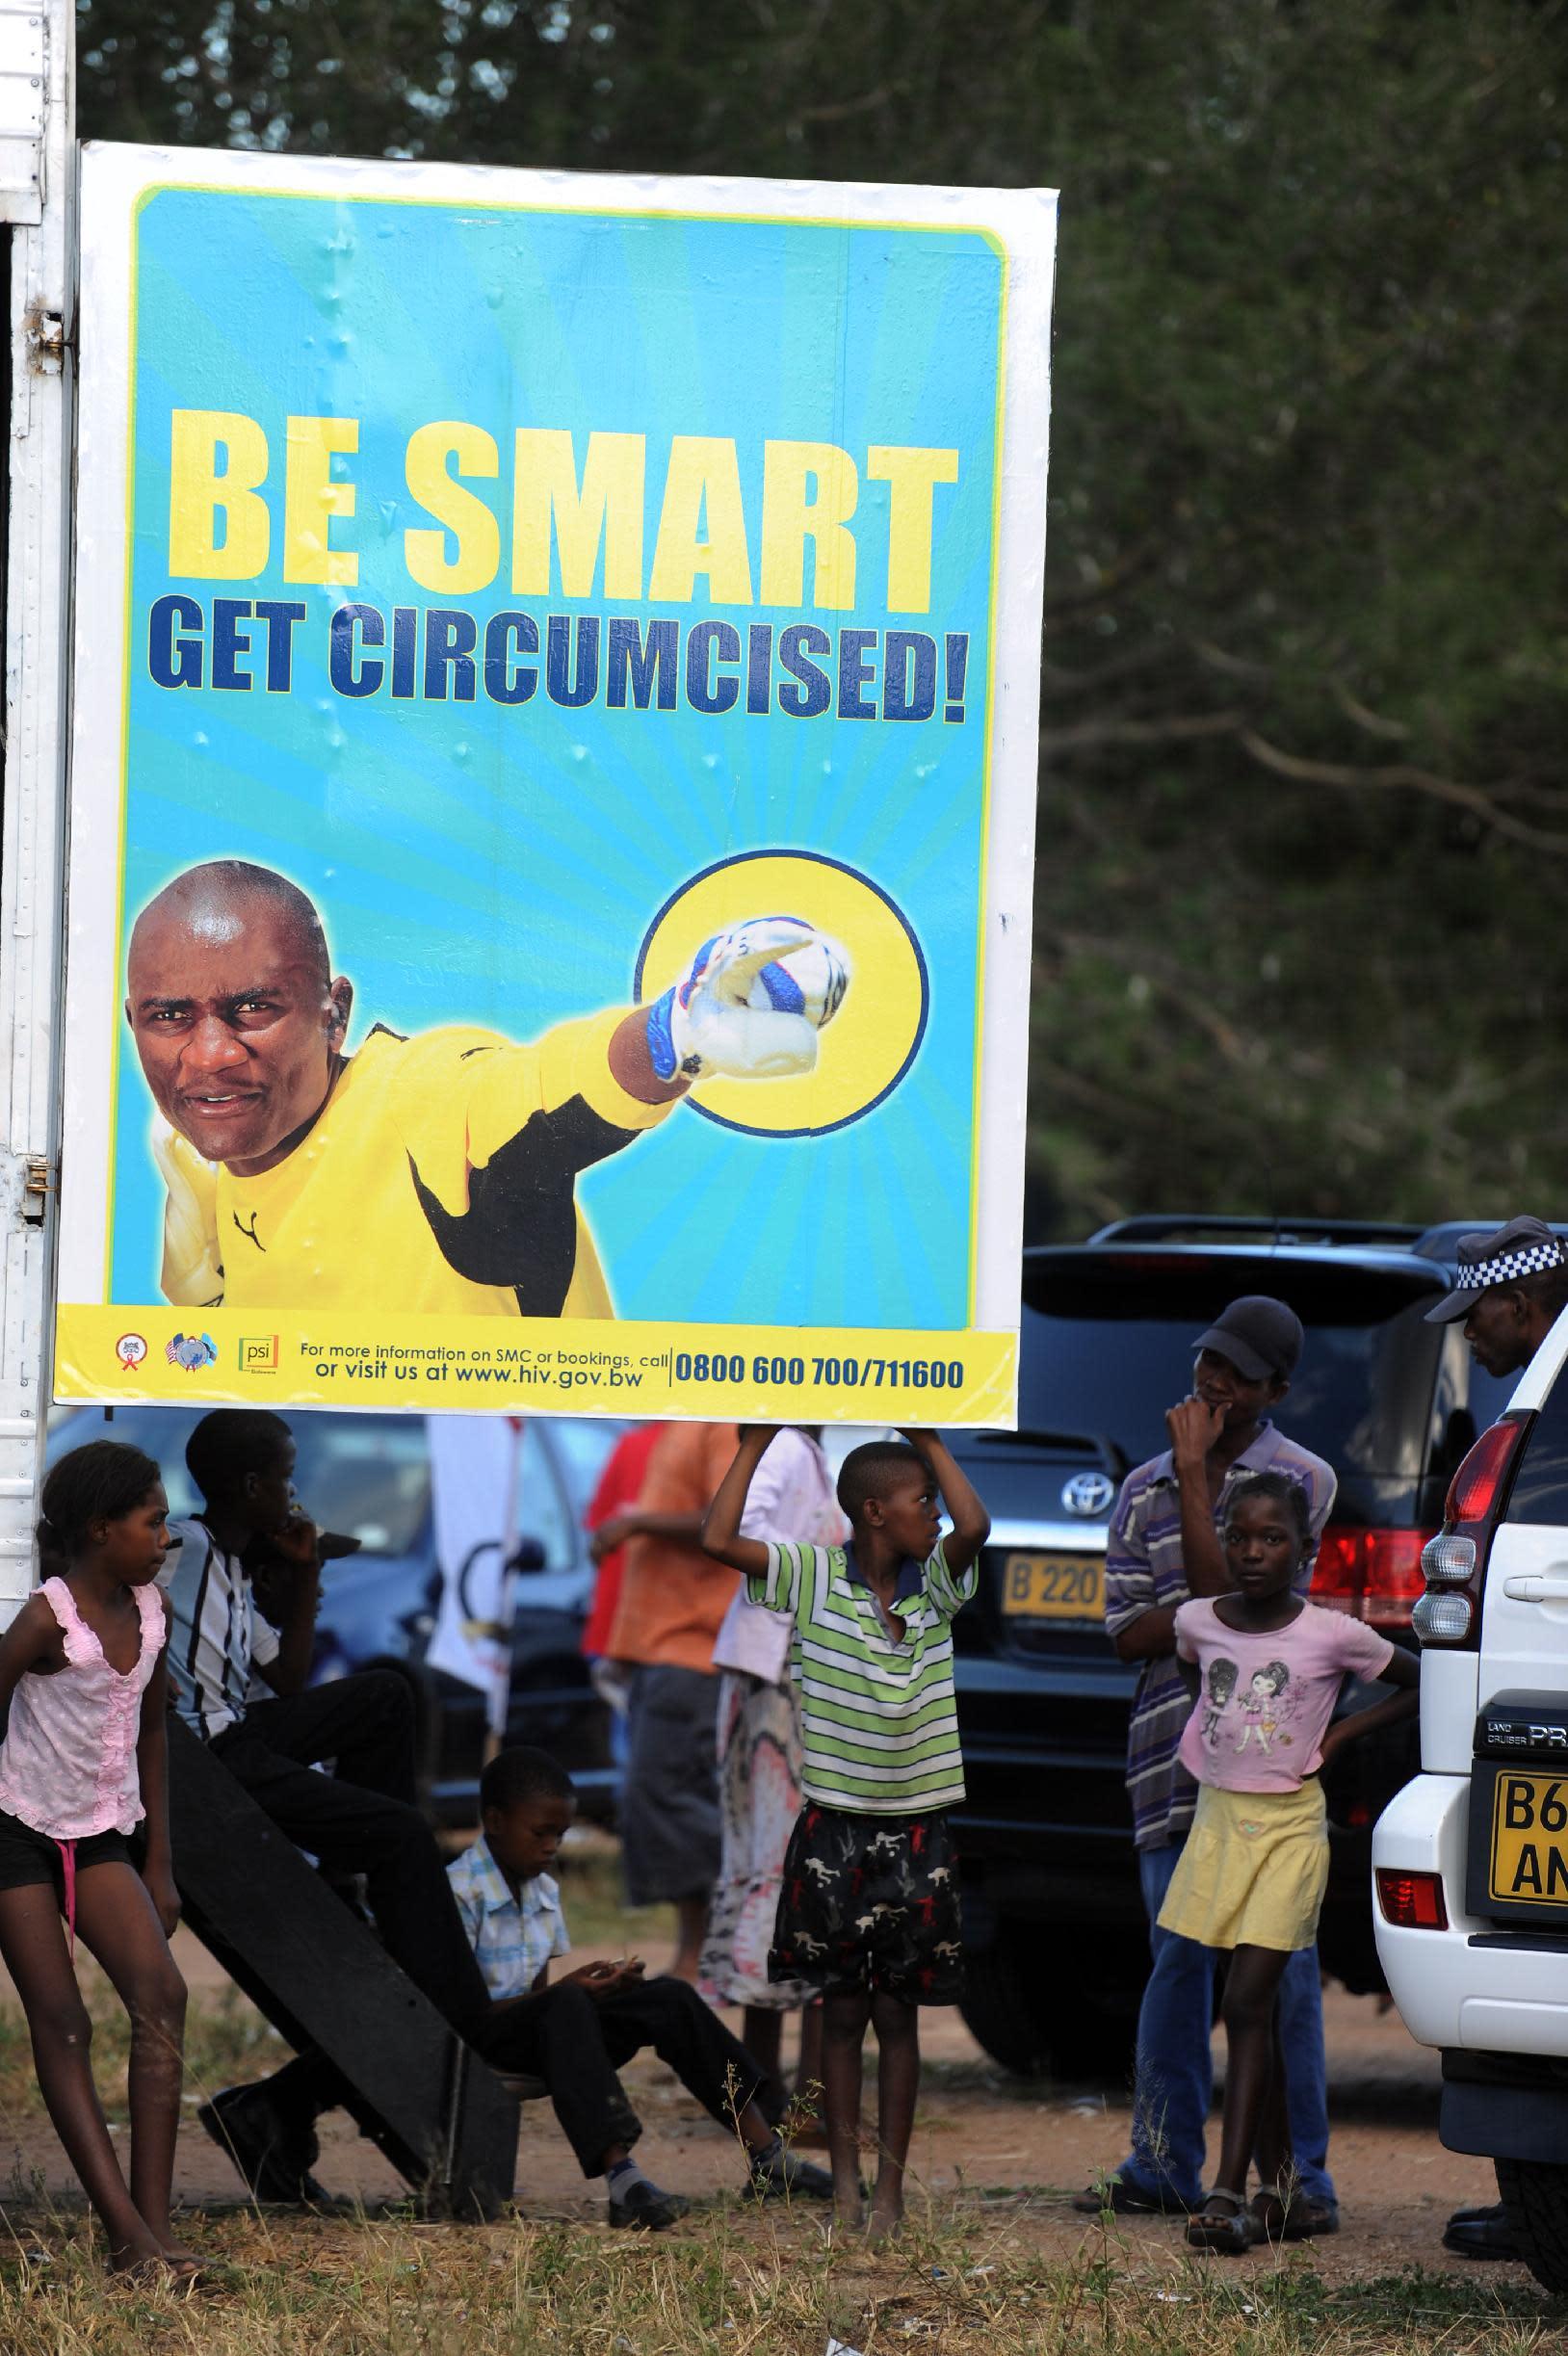 File photo taken in Gaborone, Botsana of an advert campaigning for male circumcision in sub-Saharan Africa (AFP Photo/Monirul Bhuiyan)